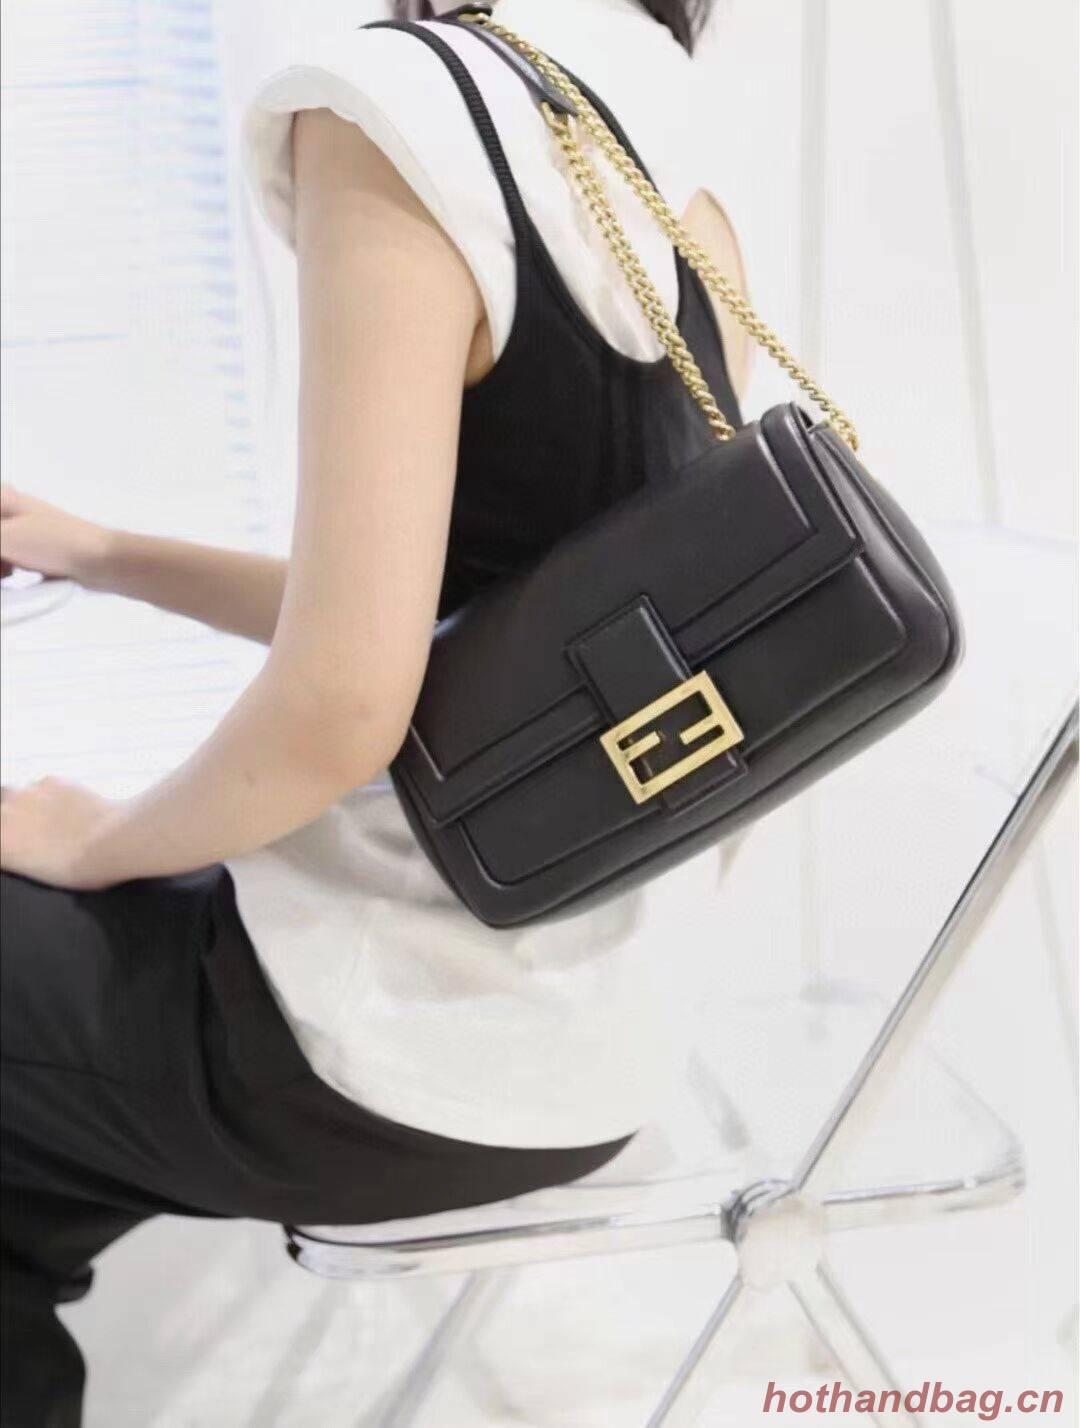 FENDI BAGUETTE CHAIN Black nappa leather bag 8BR783A